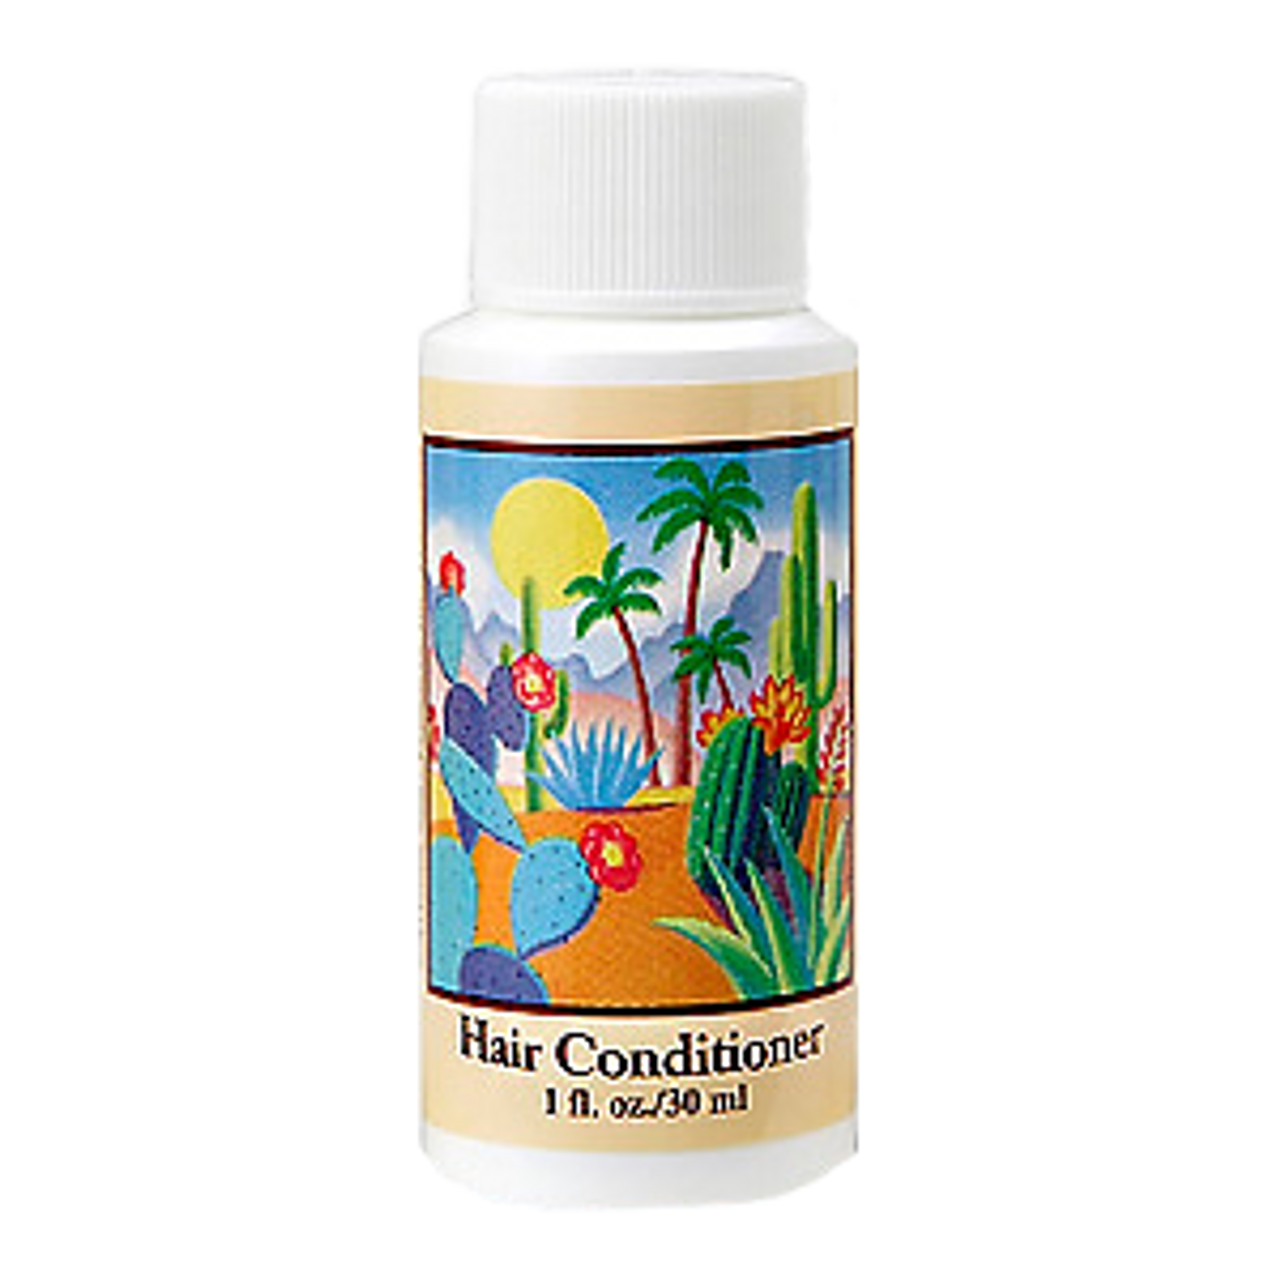 Hair Conditioner - 1oz